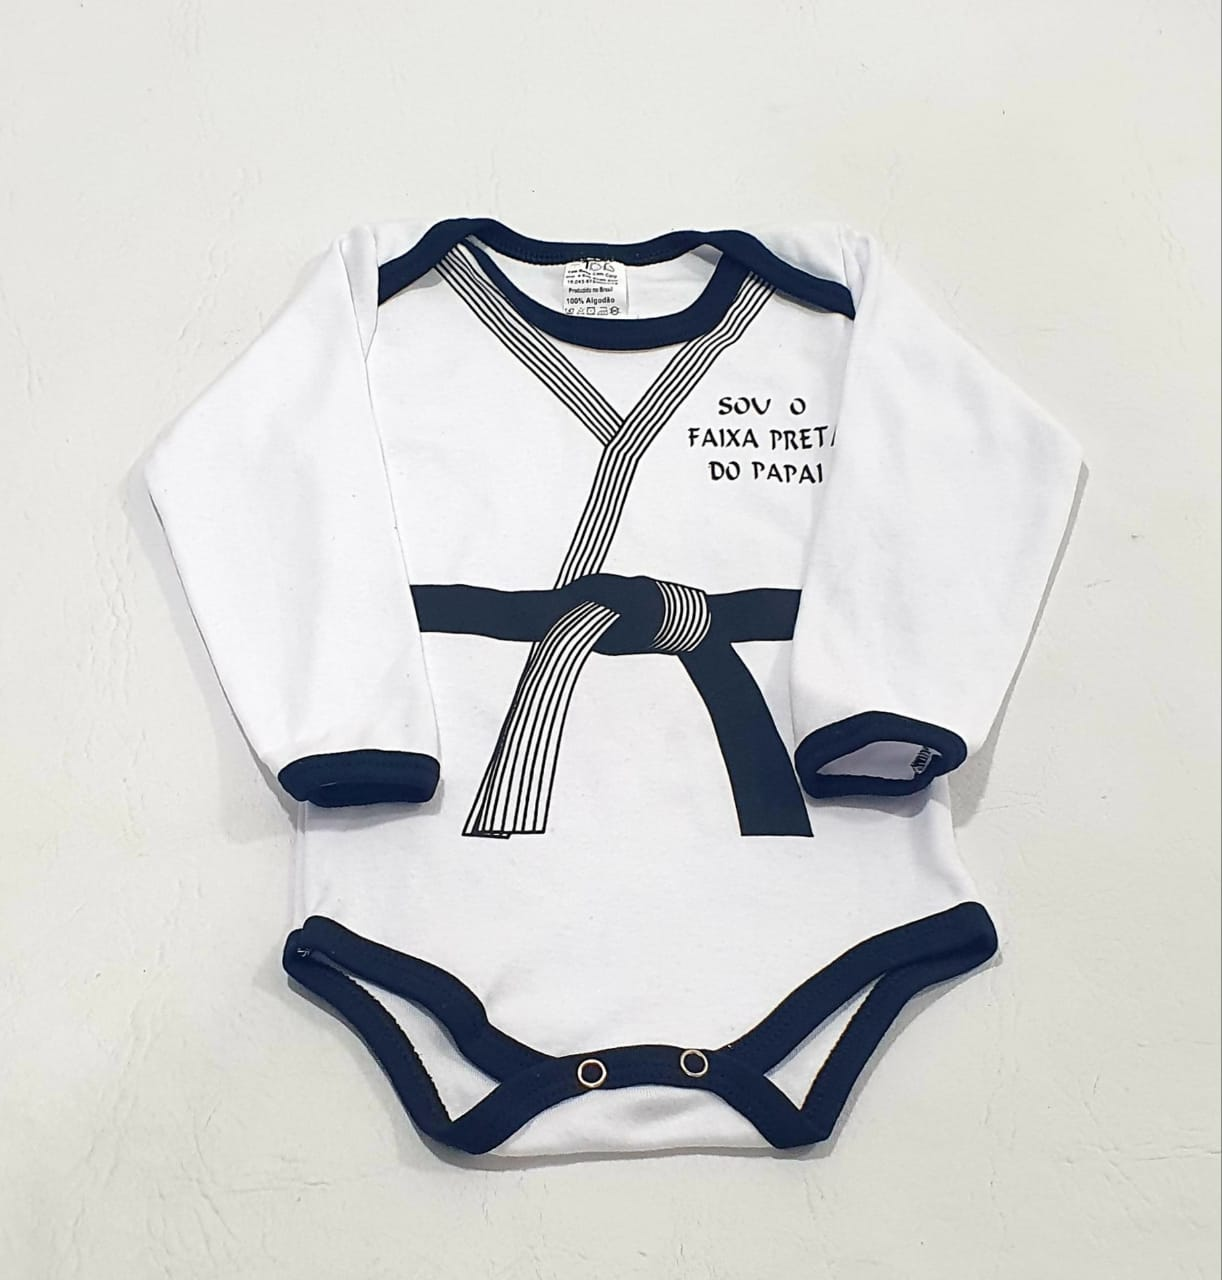 Body Manga Longa Estampado - 01 Peça - 100% Algodão Suedine - Yala Baby